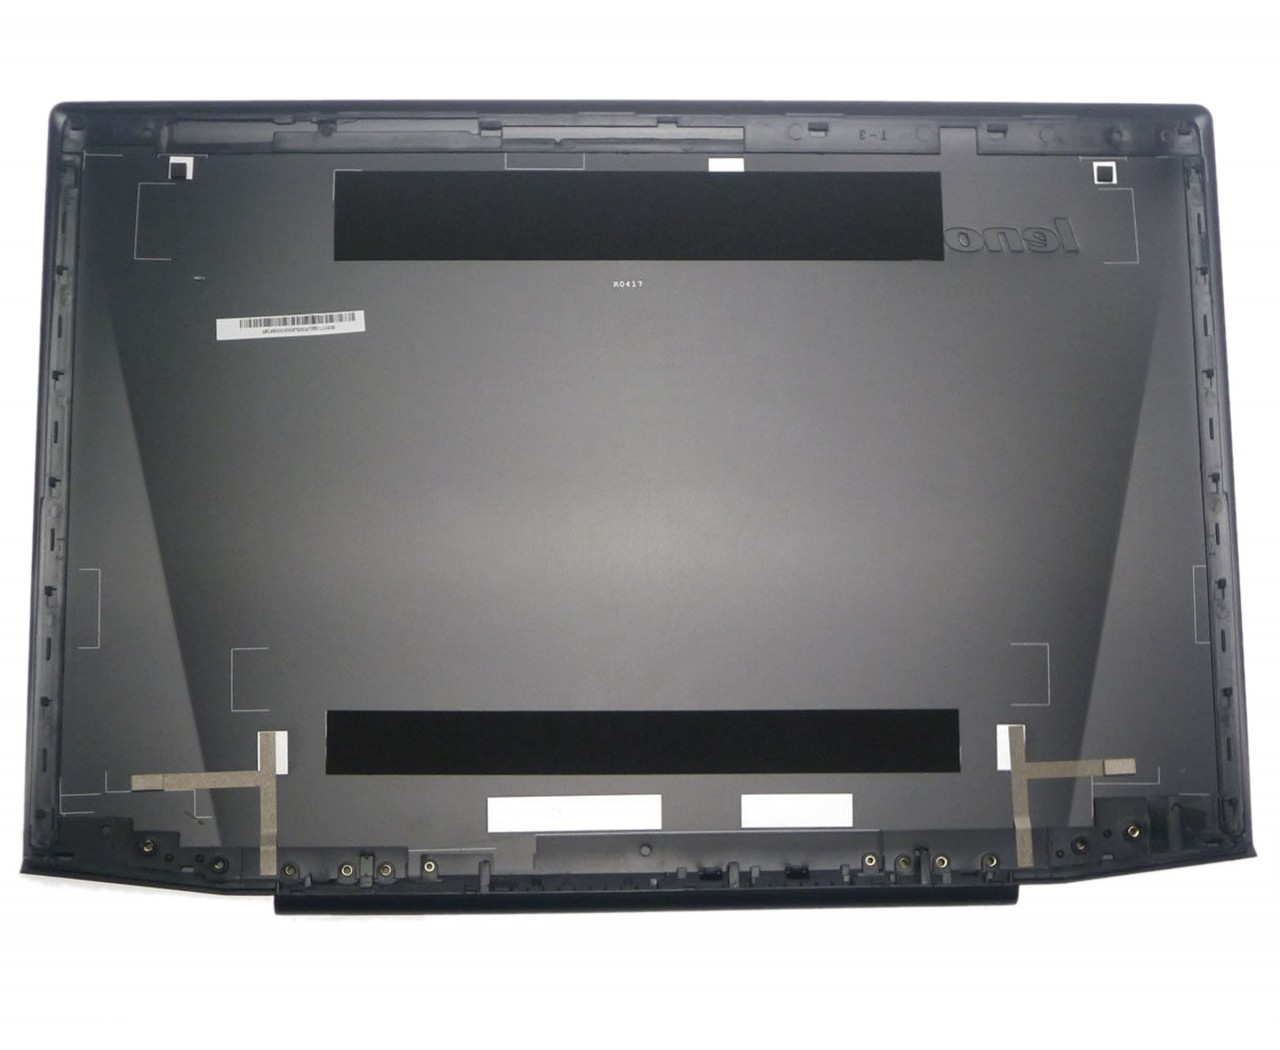 Capac Display BackCover Lenovo Y50 80 Touchscreen Carcasa Display Neagra imagine powerlaptop.ro 2021